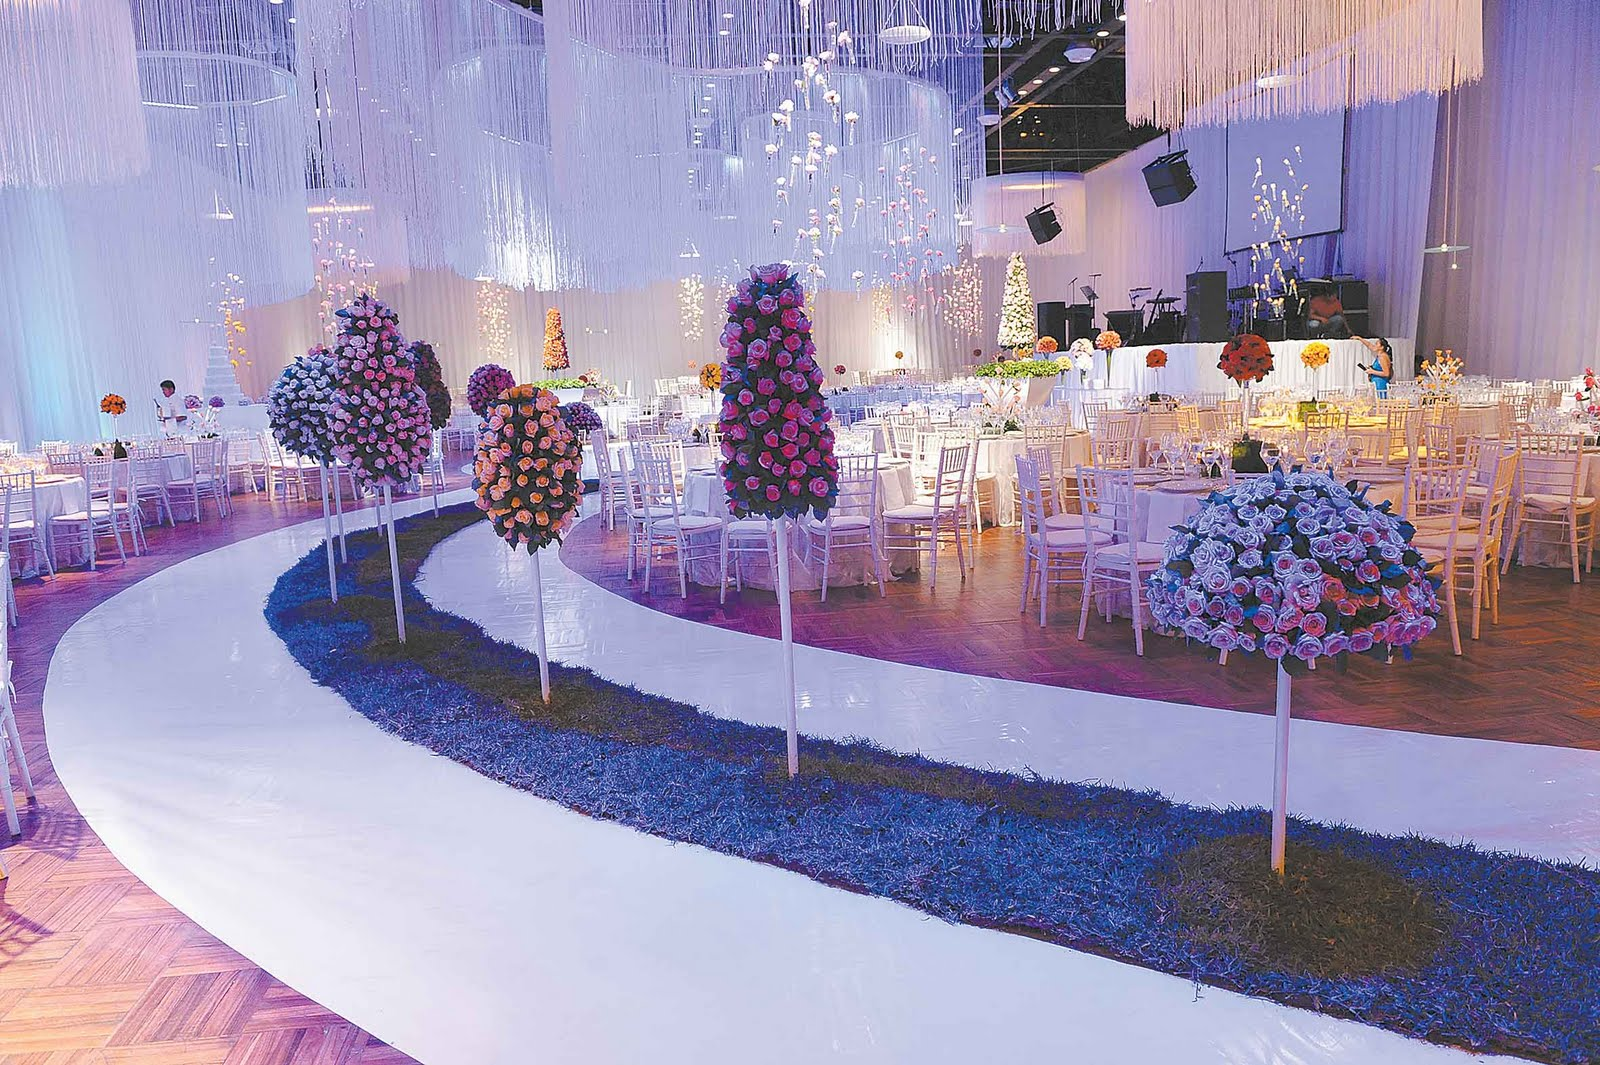 Decoraci n para eventos salones pasi n drama belleza for Decoracion navidena para eventos